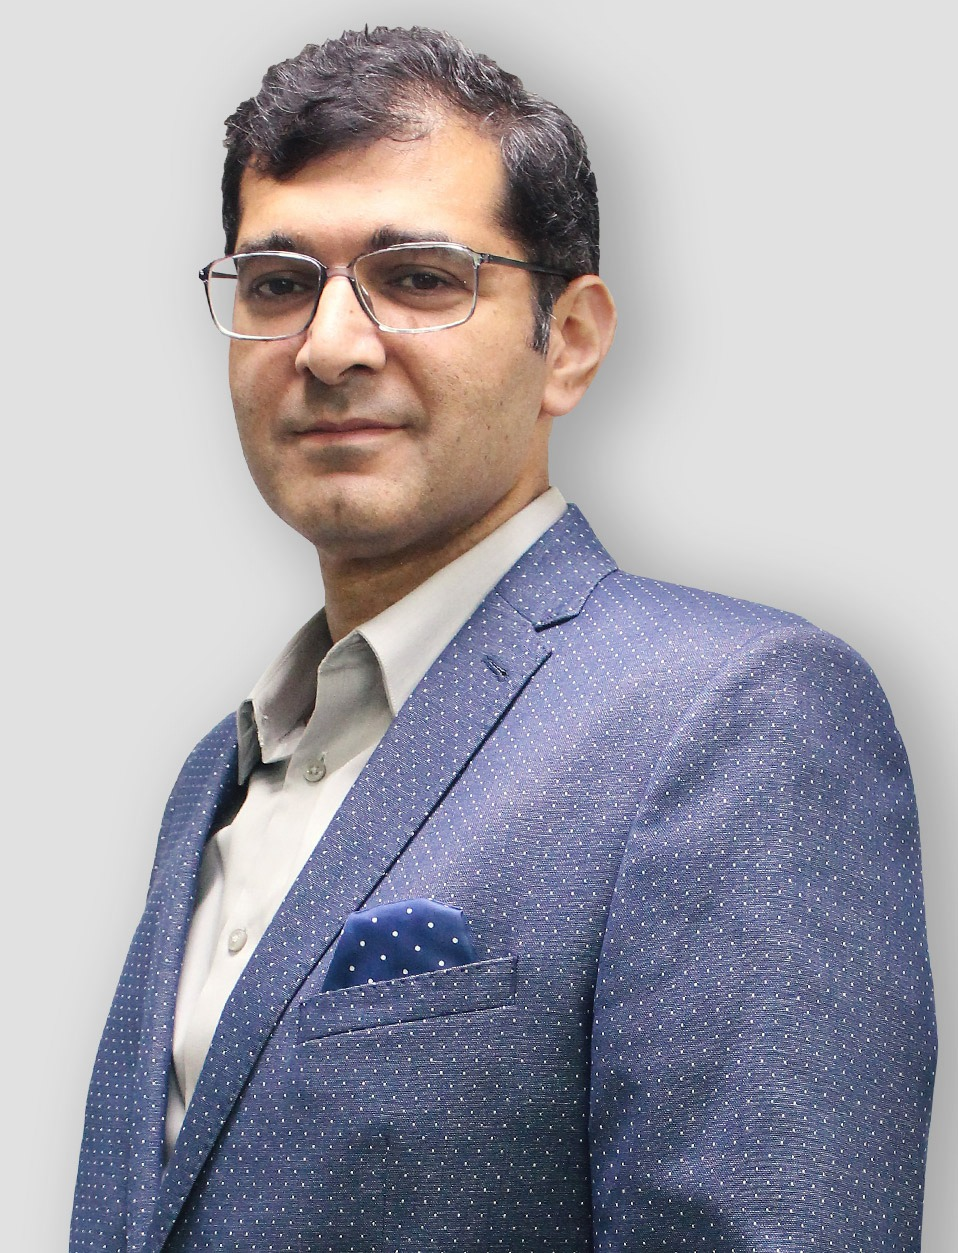 Asif Peer